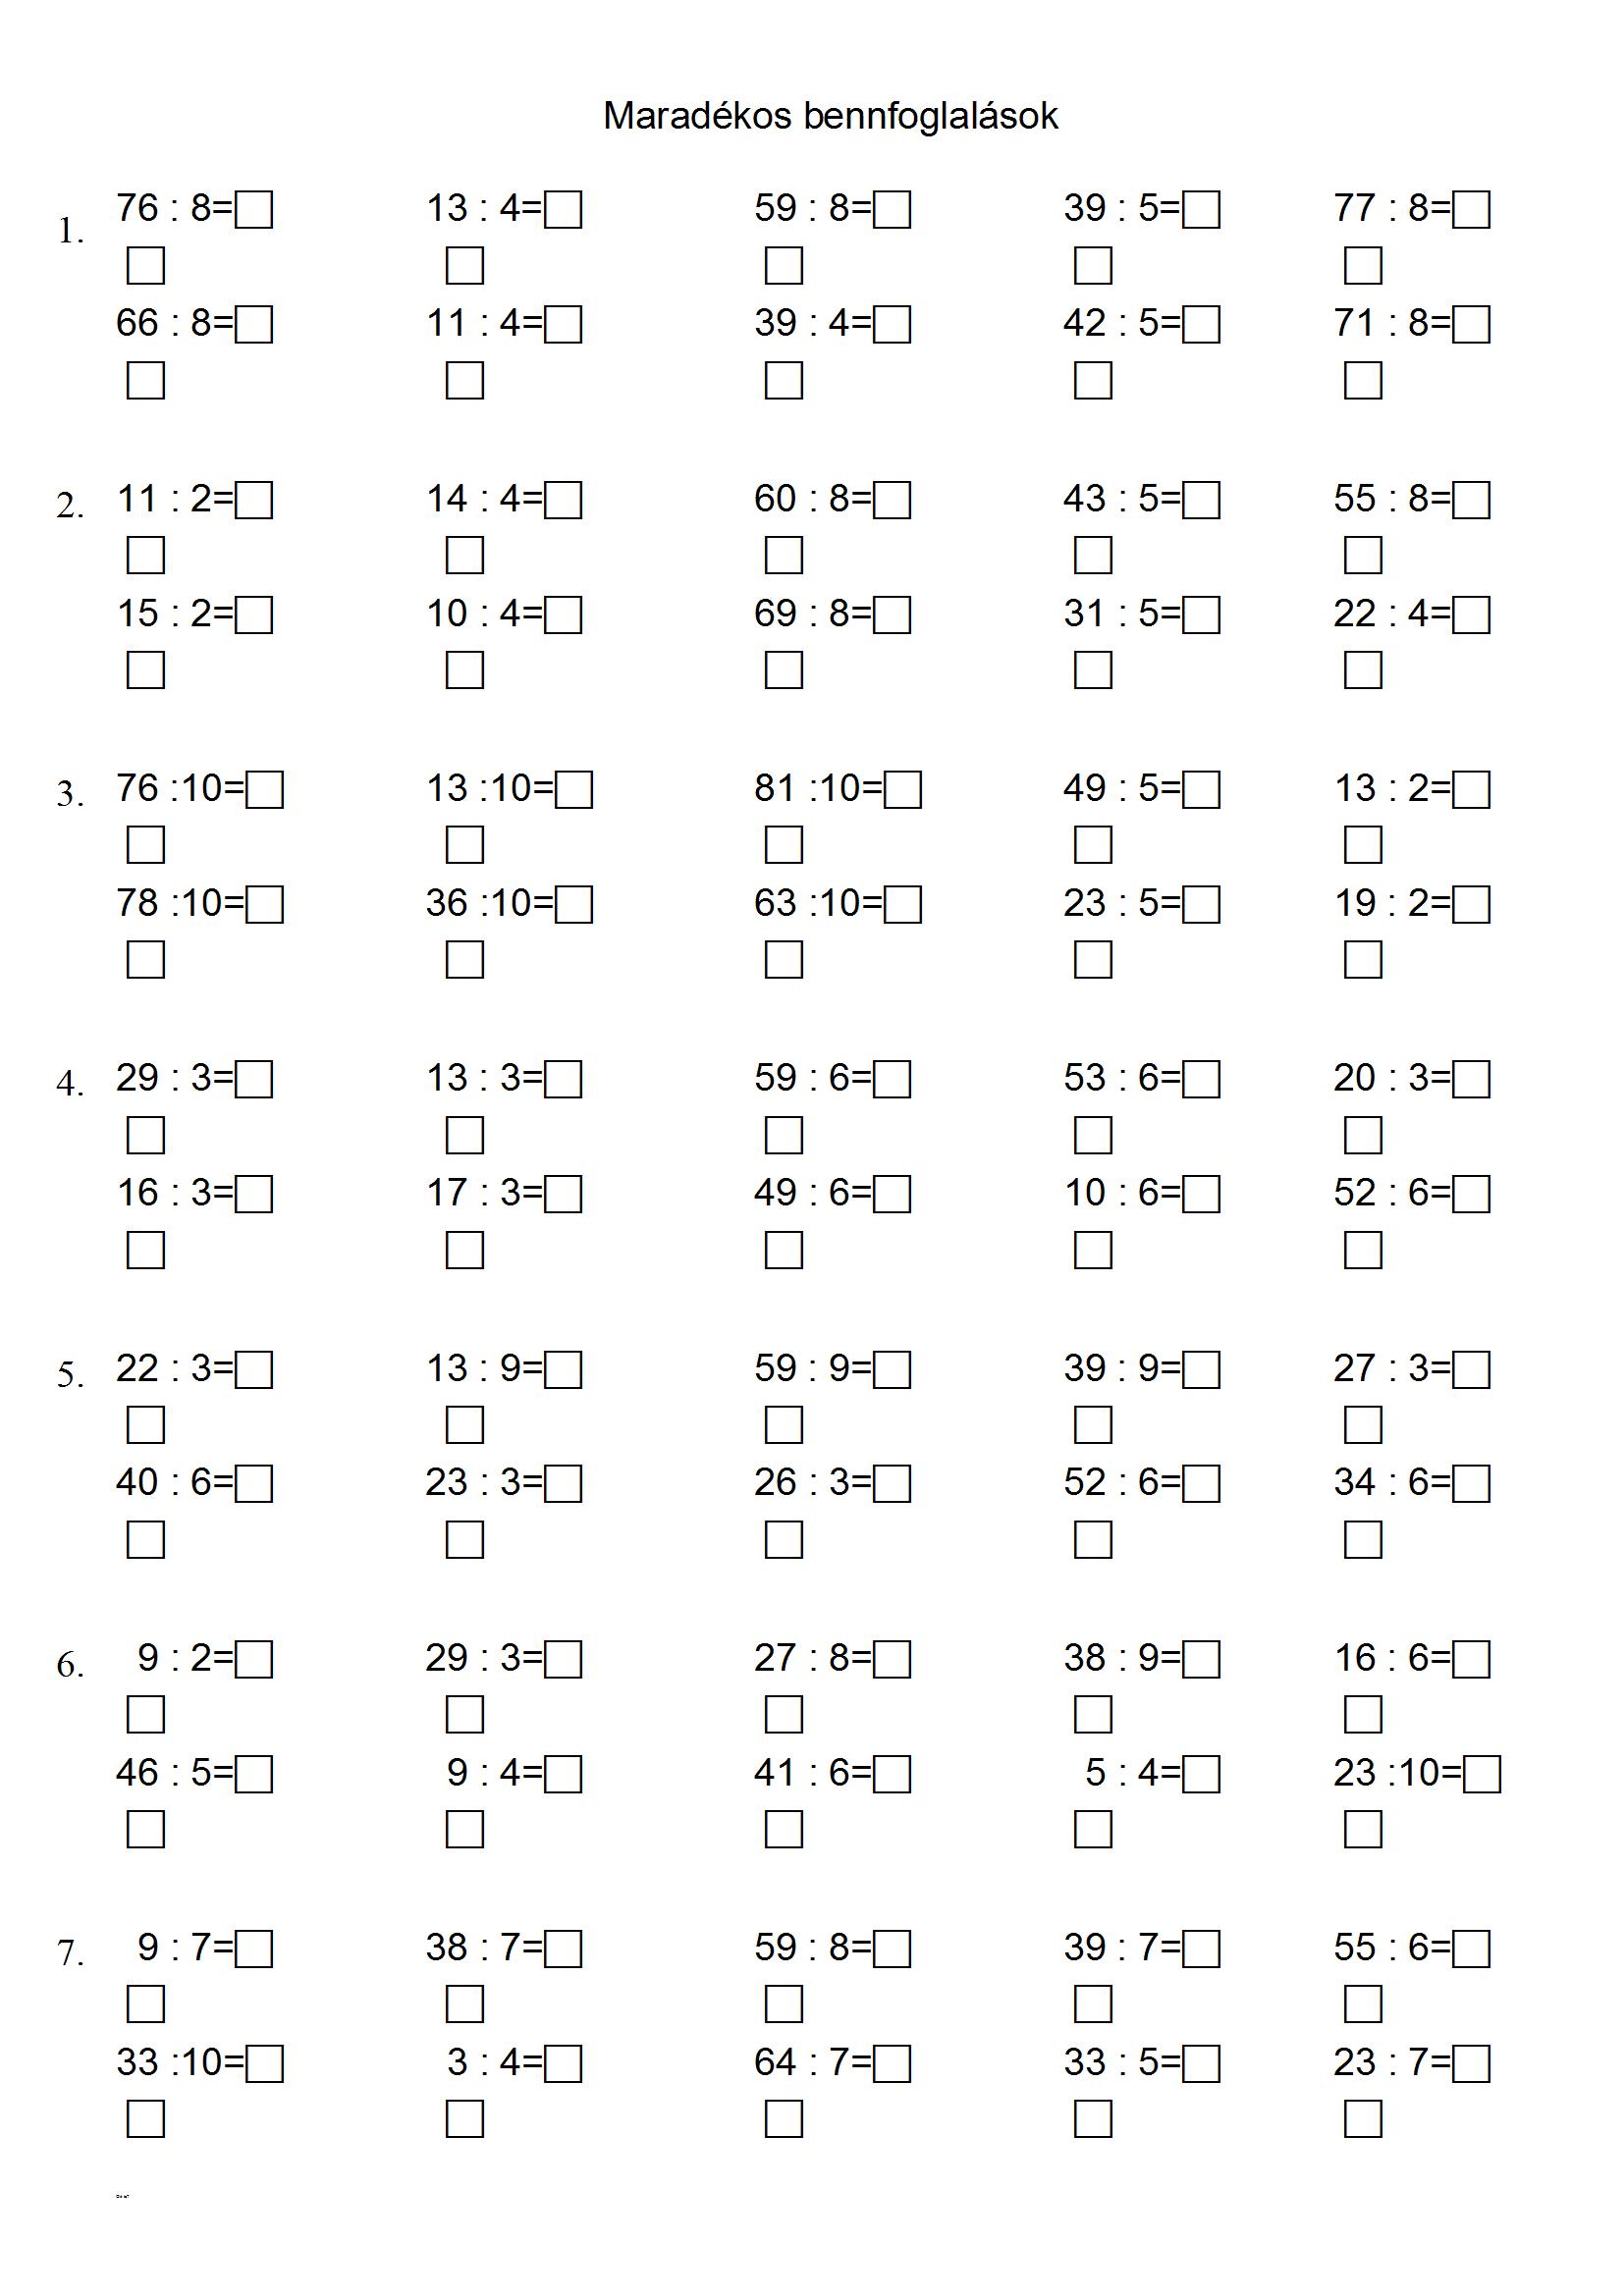 hight resolution of Maradékos bennfoglalások1.doc   Homeschool math